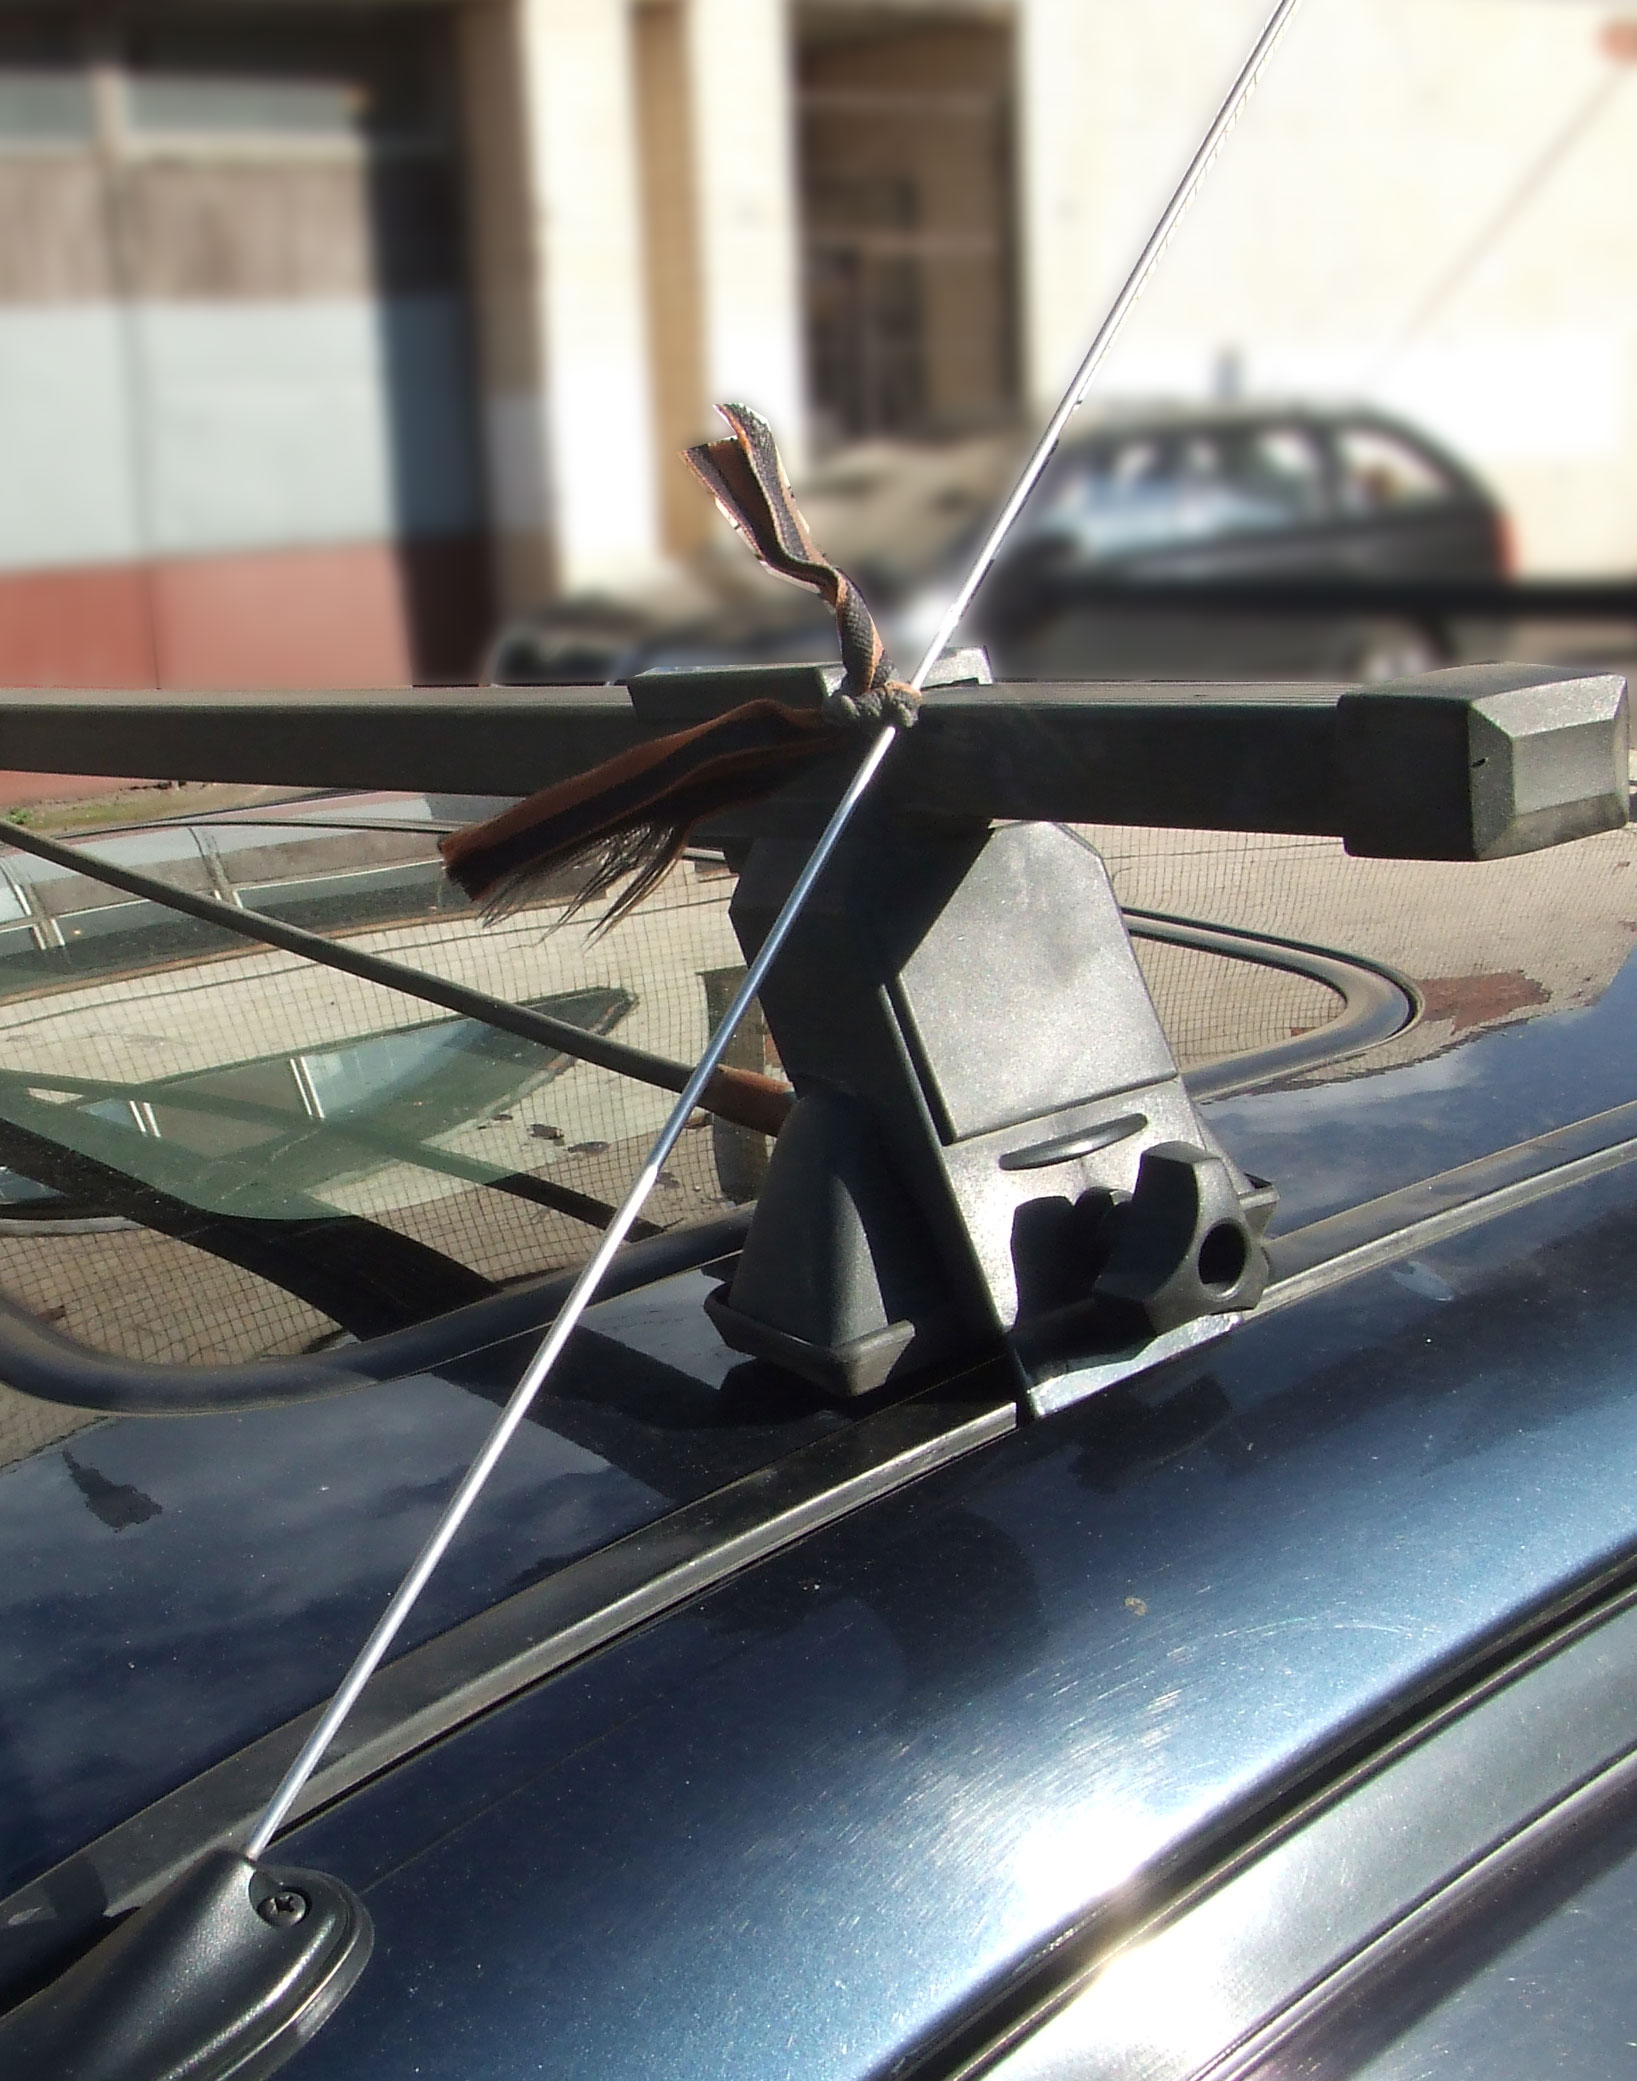 b18 - Антенны для автомобиля нет связи